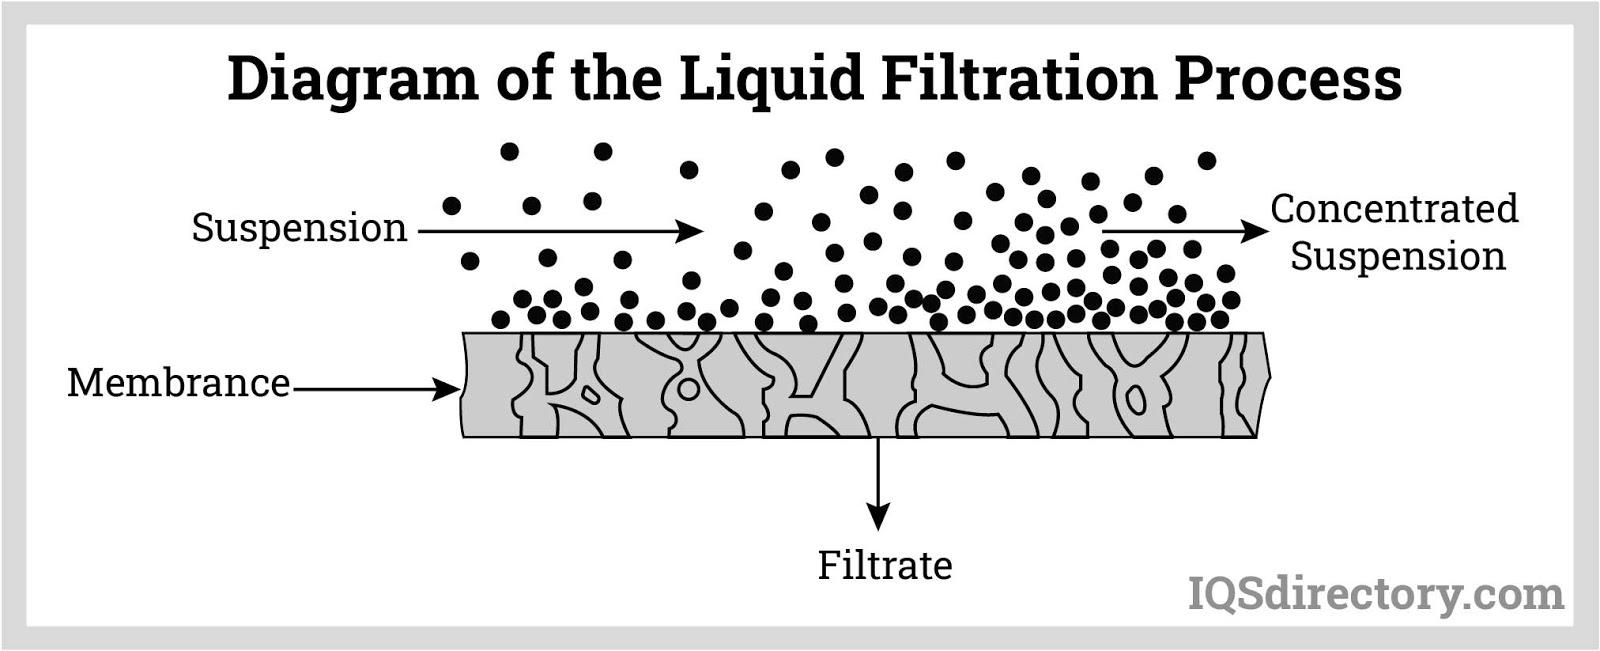 Diagram of the Liquid Filtration Process